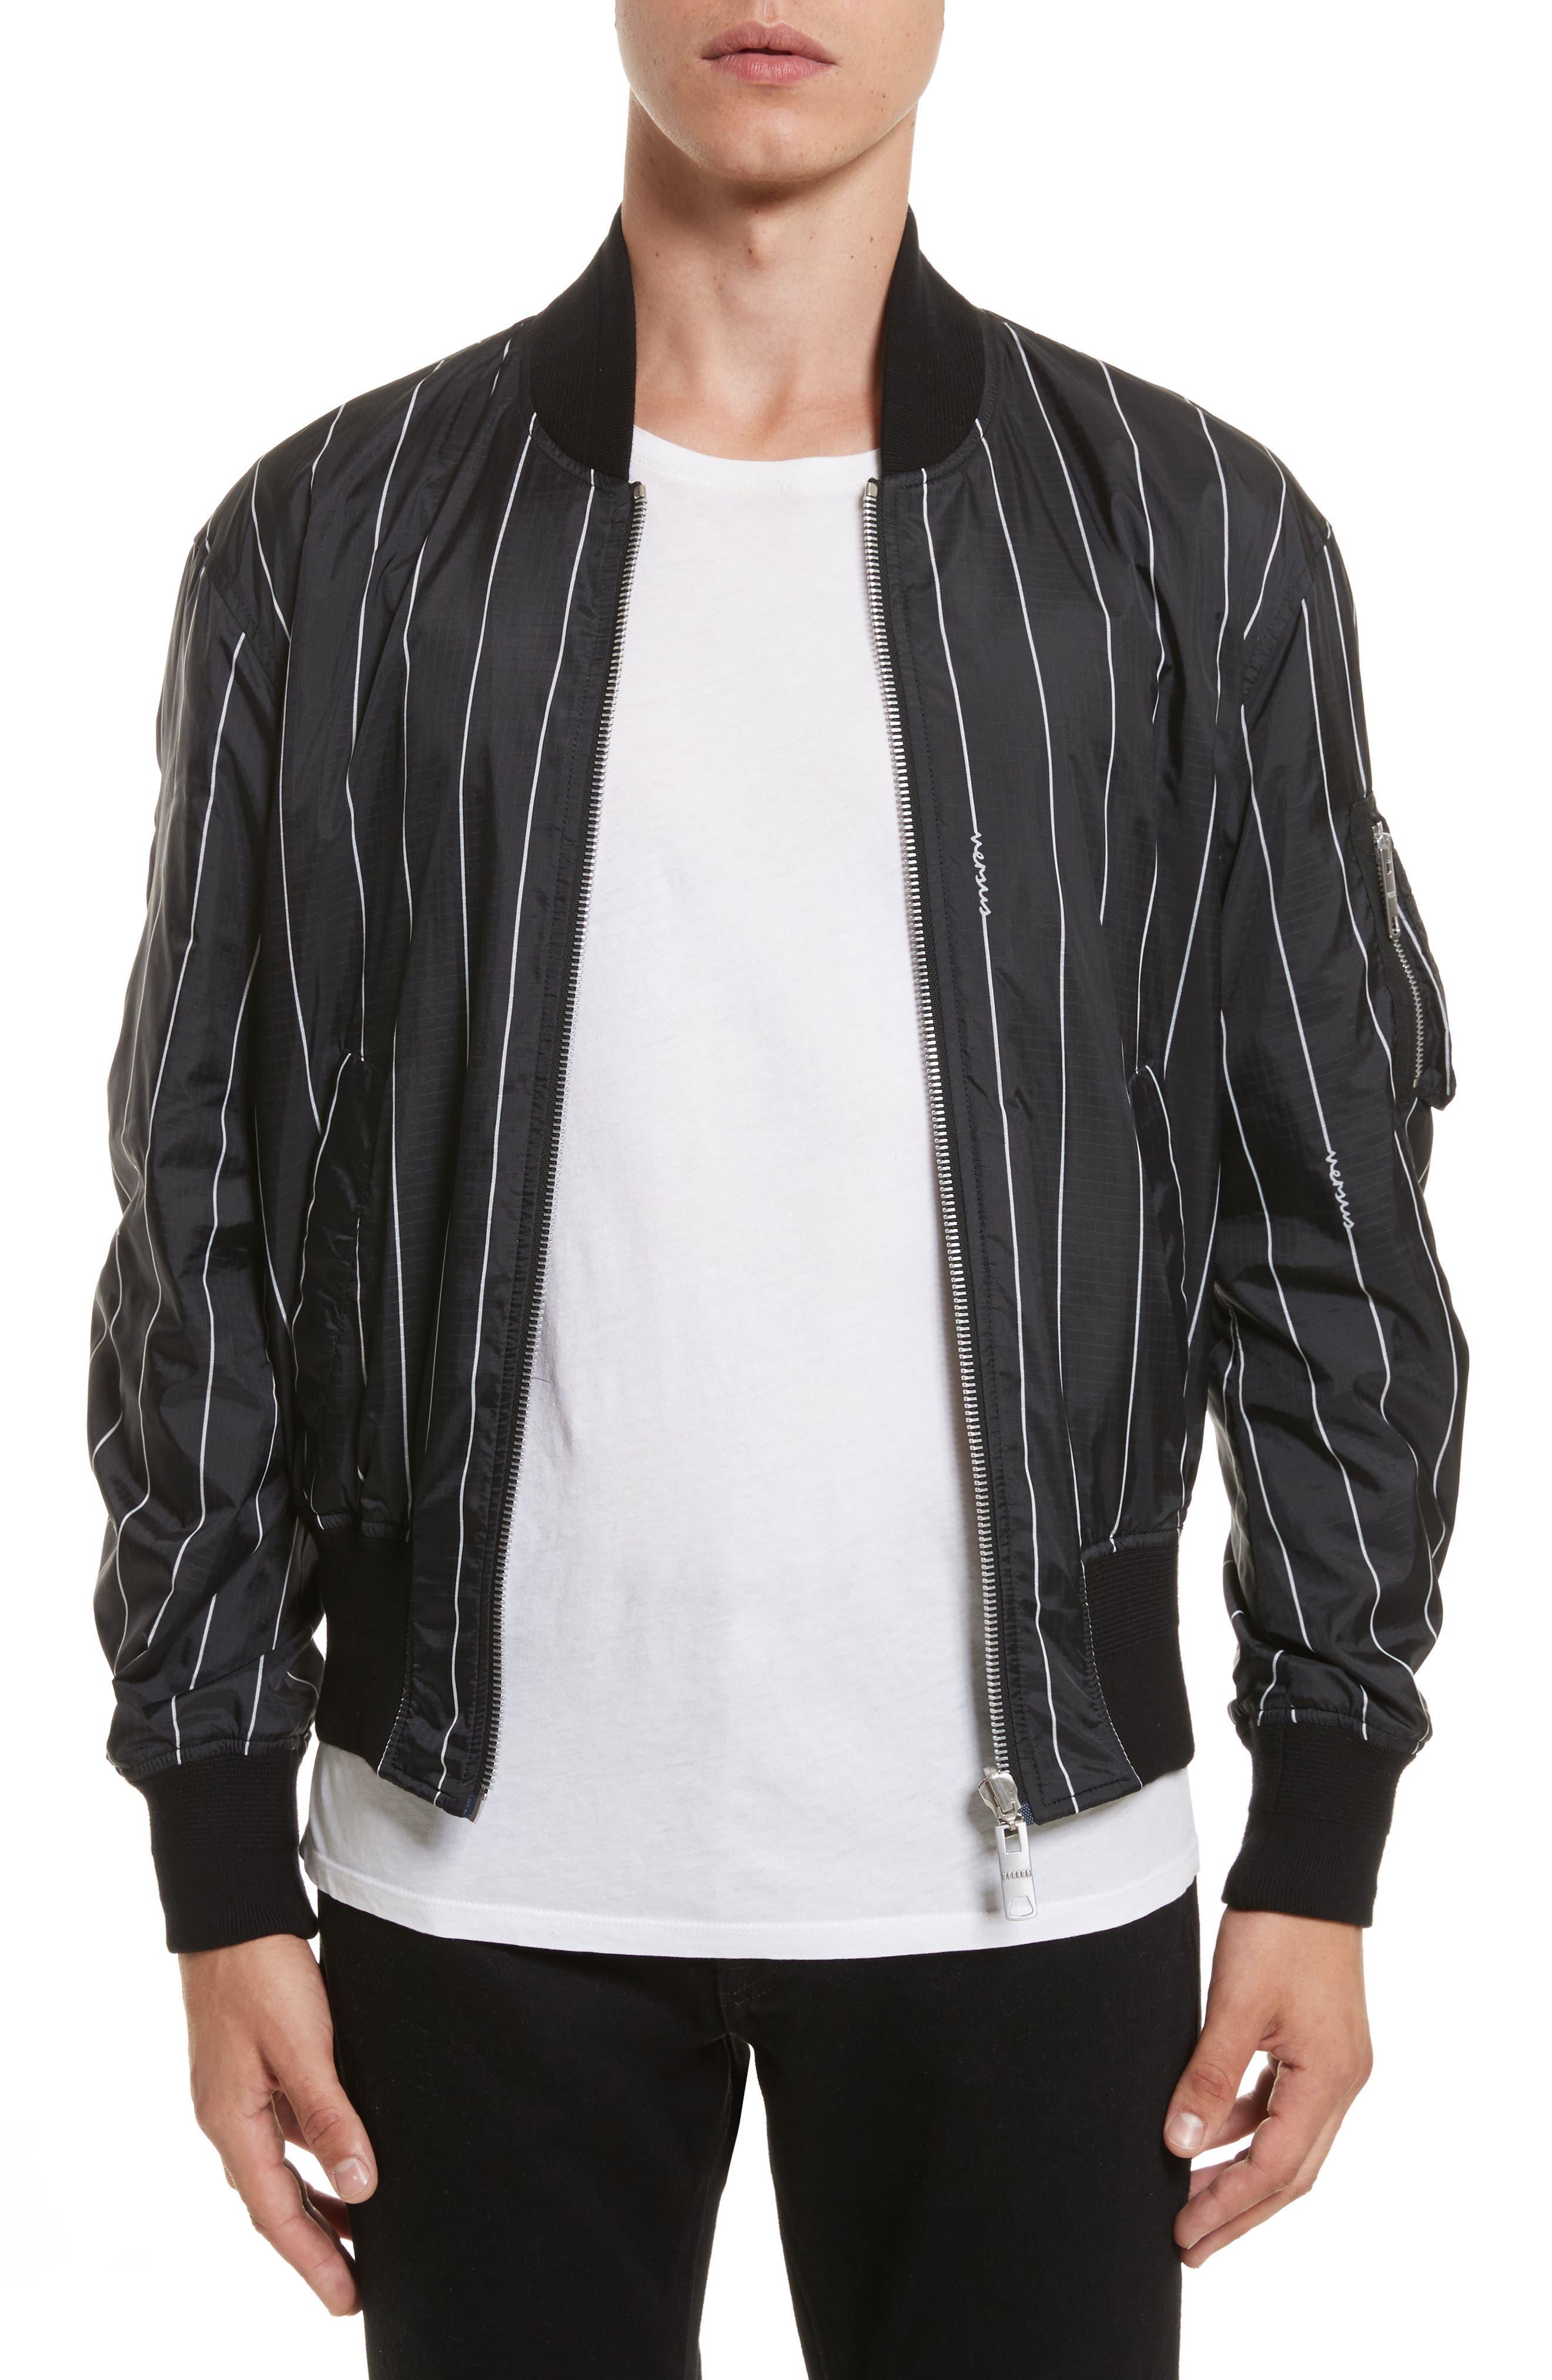 VERSUS by Versace Reversible Pinstripe Bomber Jacket,                             Main thumbnail 1, color,                             Black